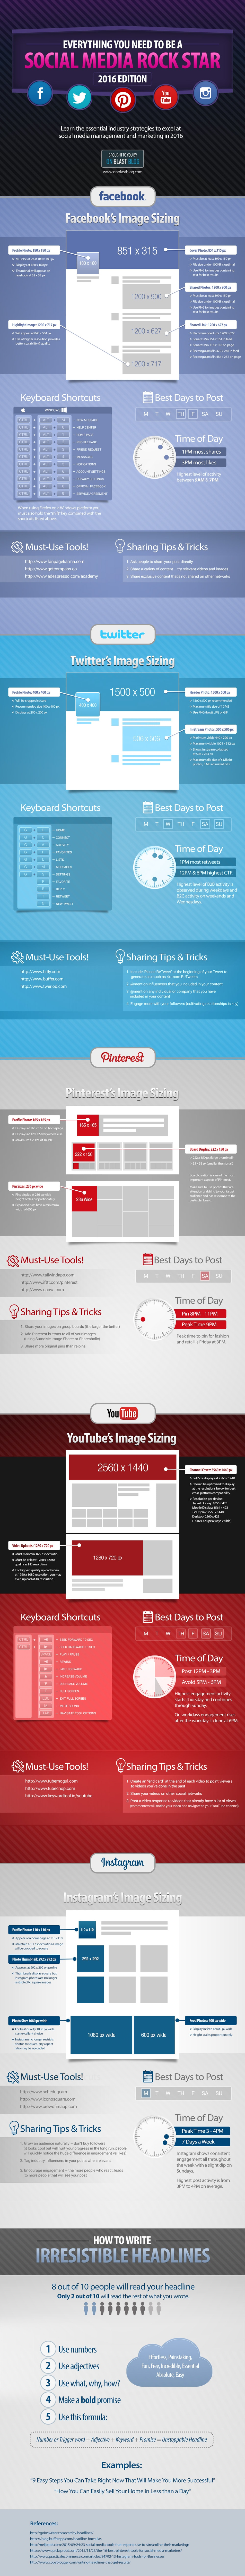 Social-Media-Image-Sizing-Cheat-Sheet